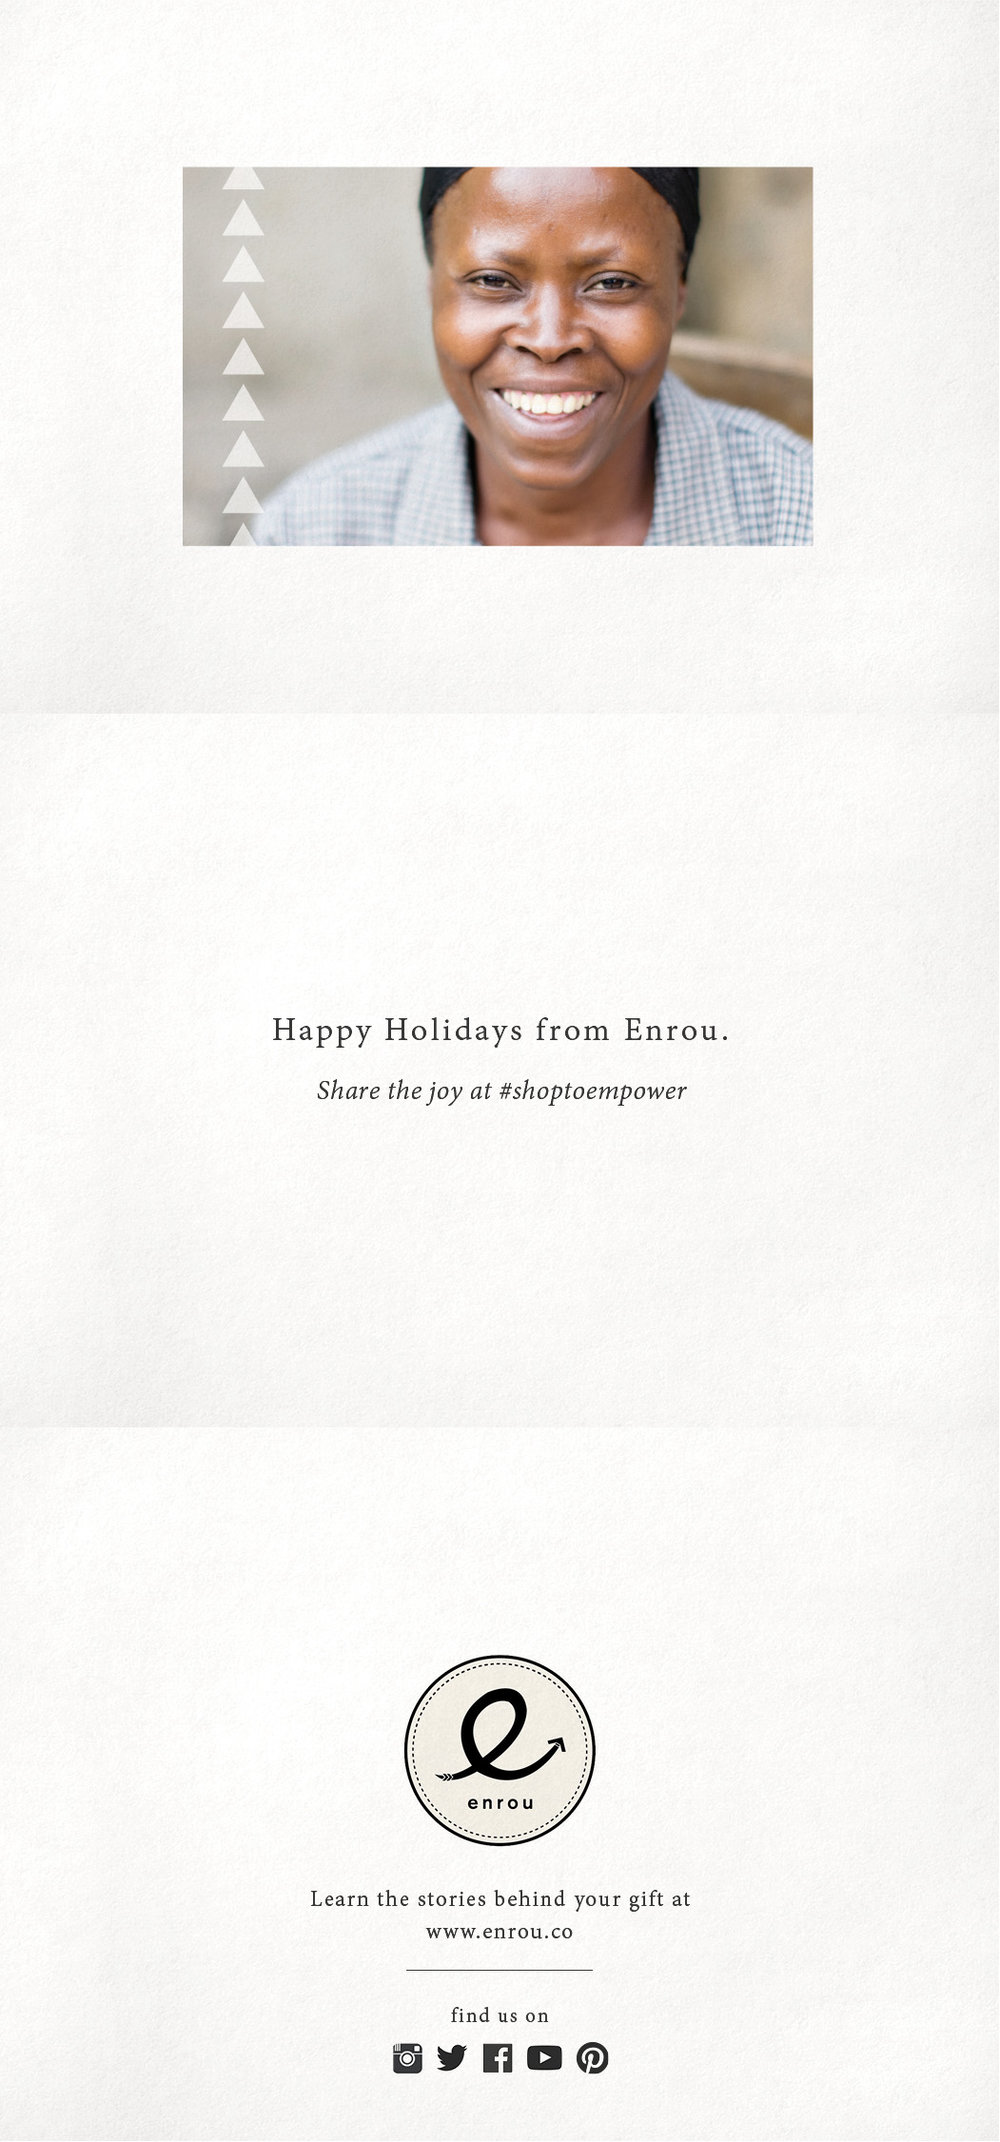 Enrou Holiday Card Layout.jpg